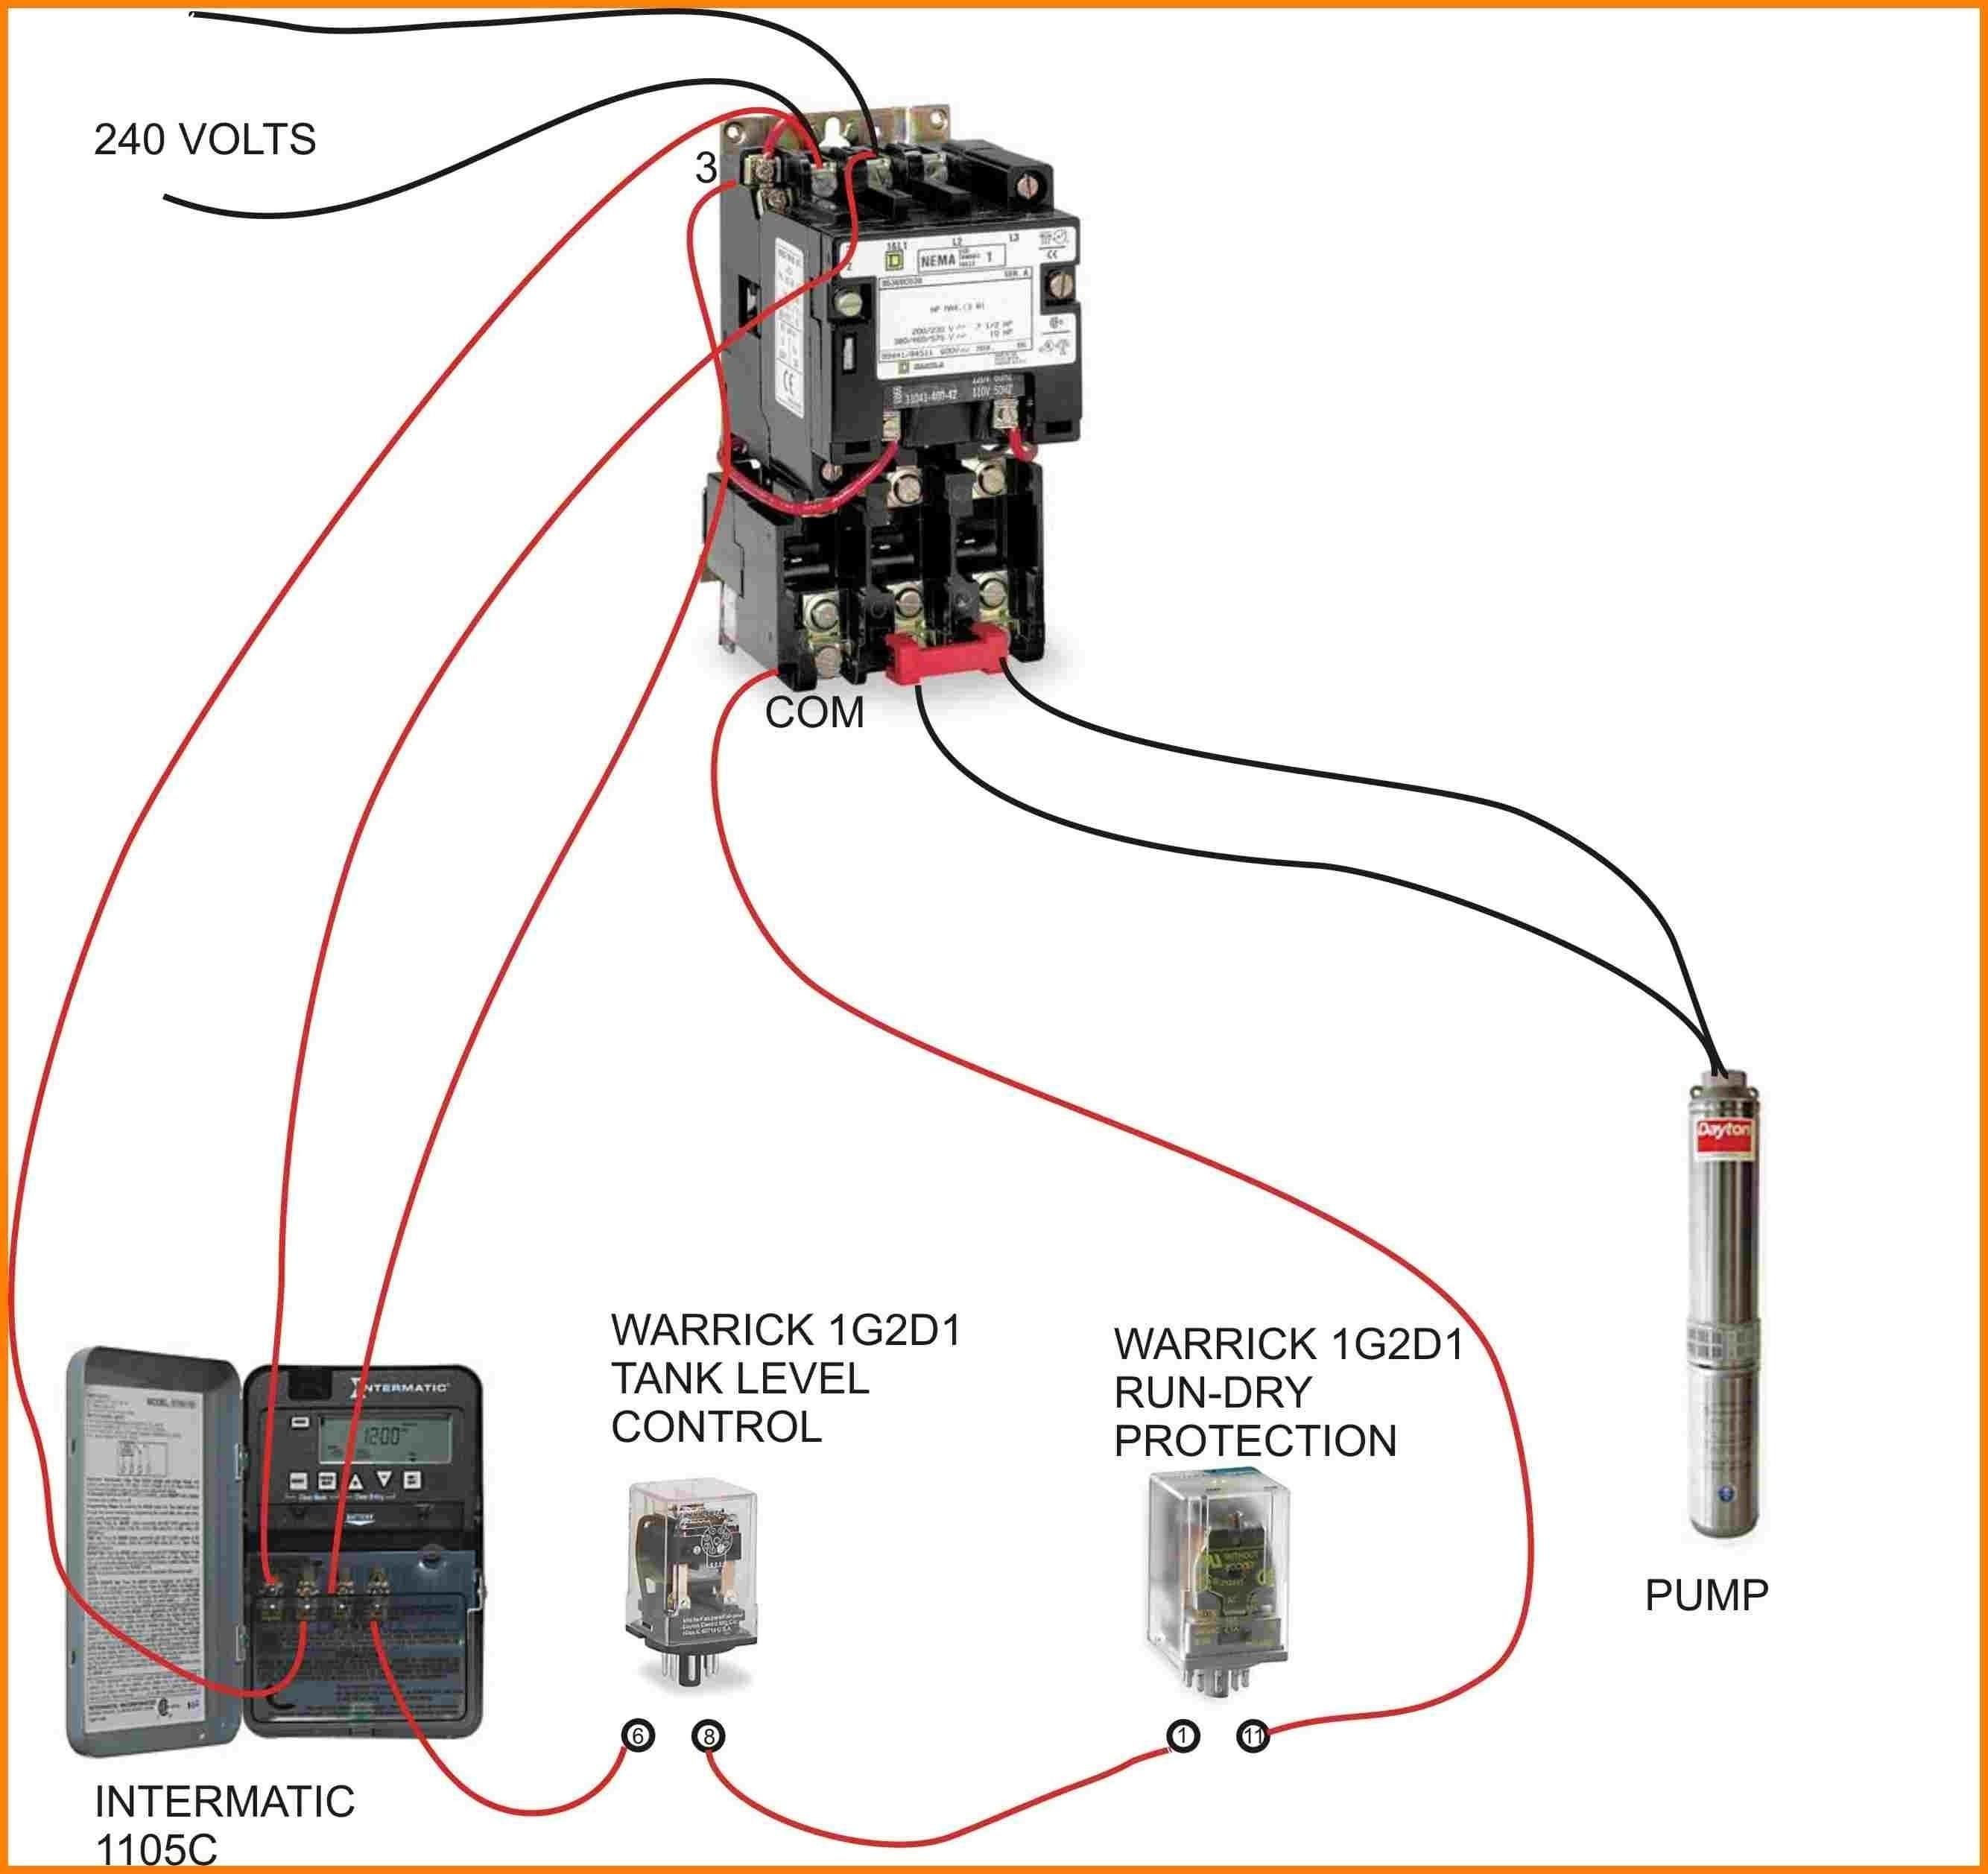 Motor Contactor Wiring Diagram Circuit Diagram Wiring A Contactor Wiring Diagram Used